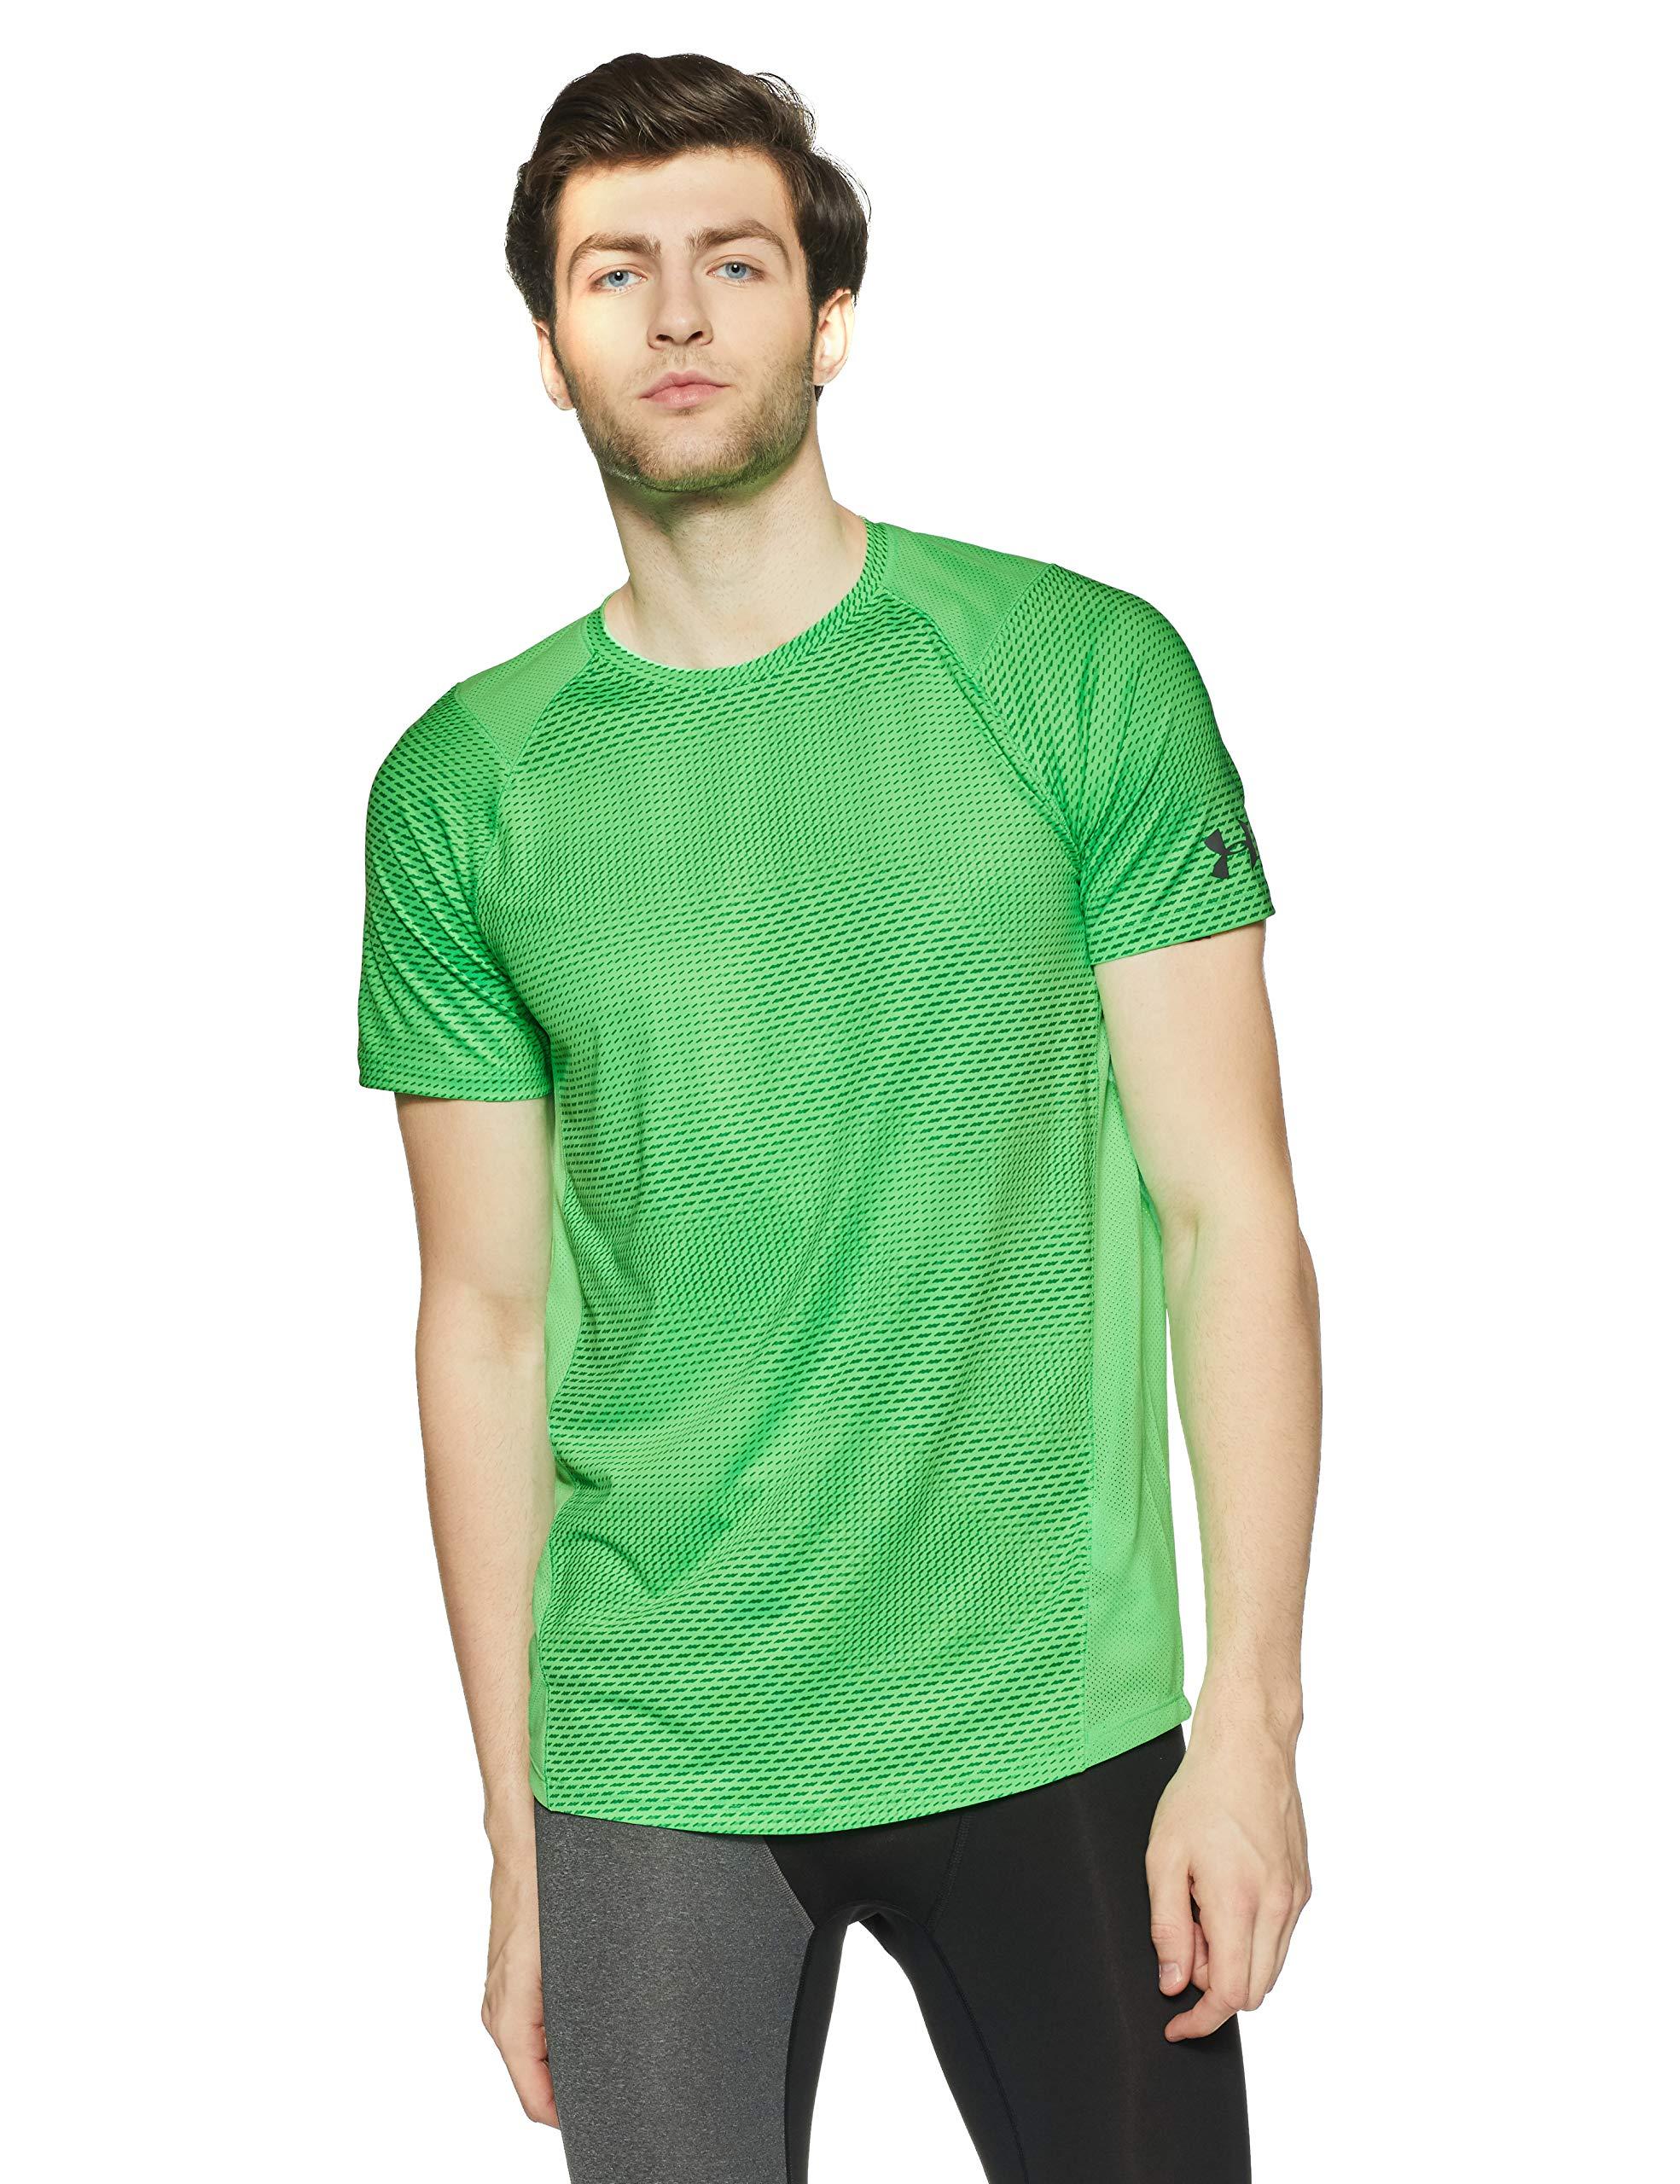 Under Armour Men's MK-1 Short Sleeve Shirt, Arena Green (701)/Graphite, Small